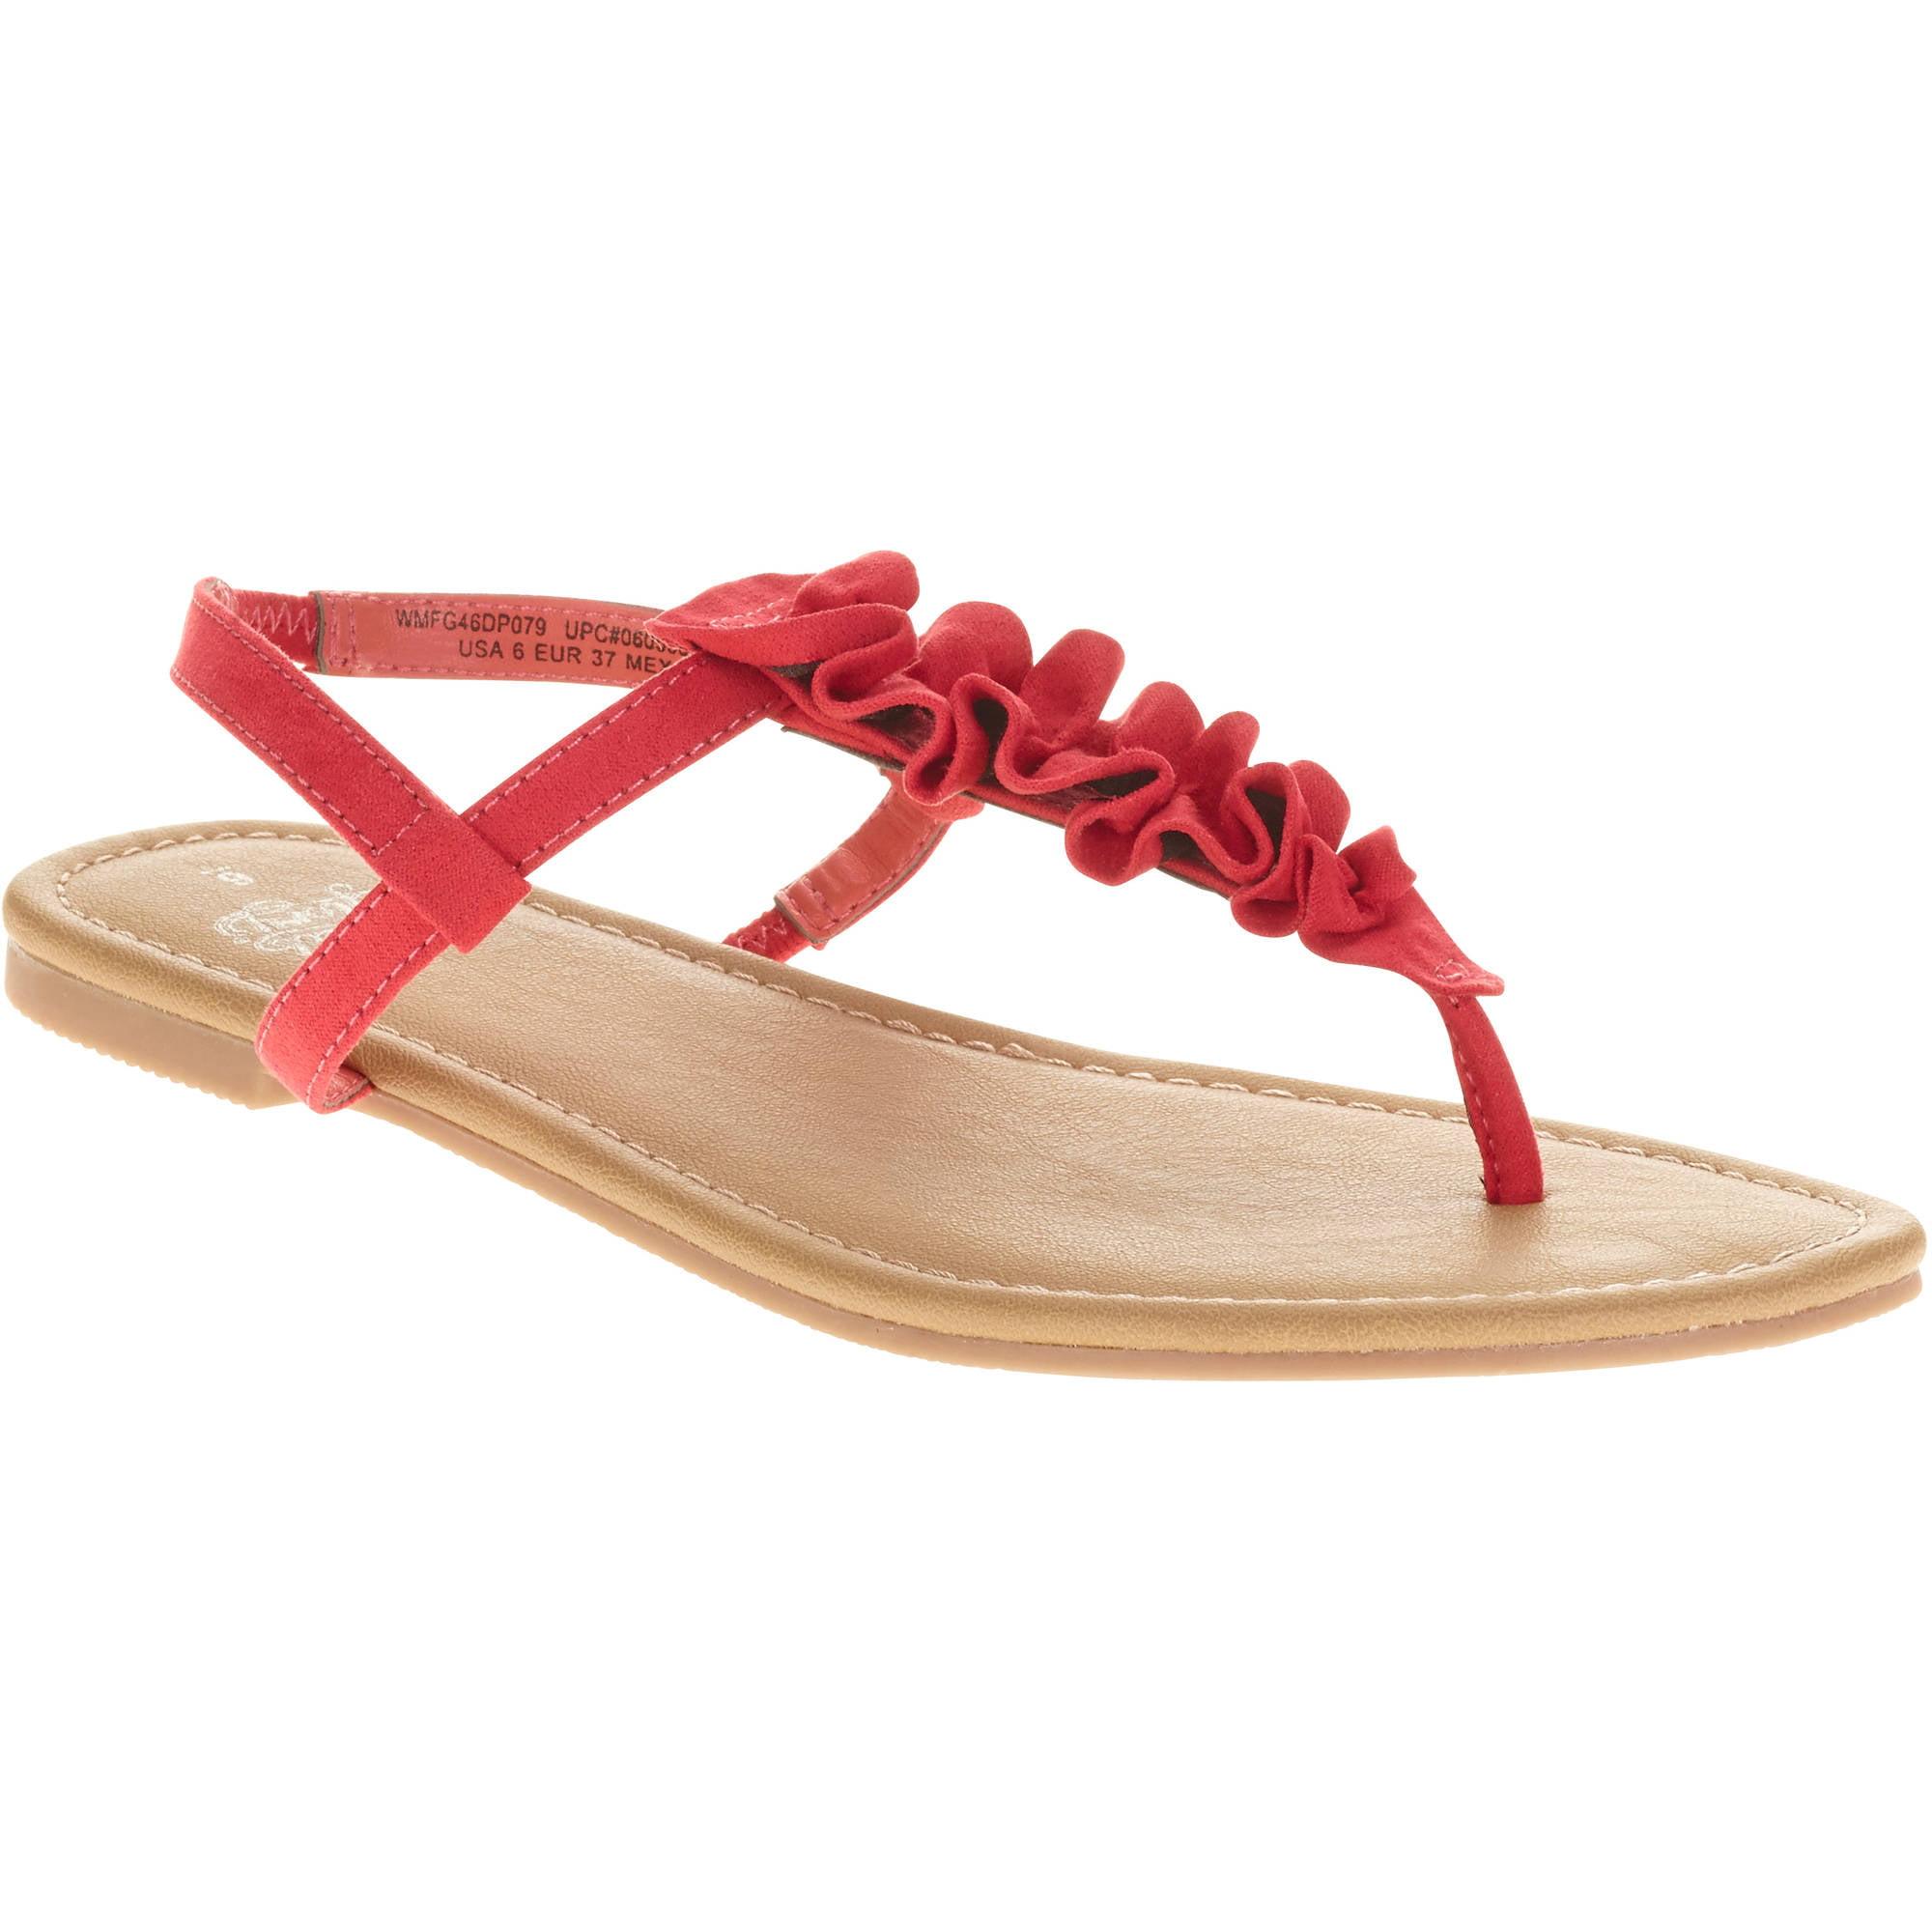 Faded Flory Women's Ruffle Sandal